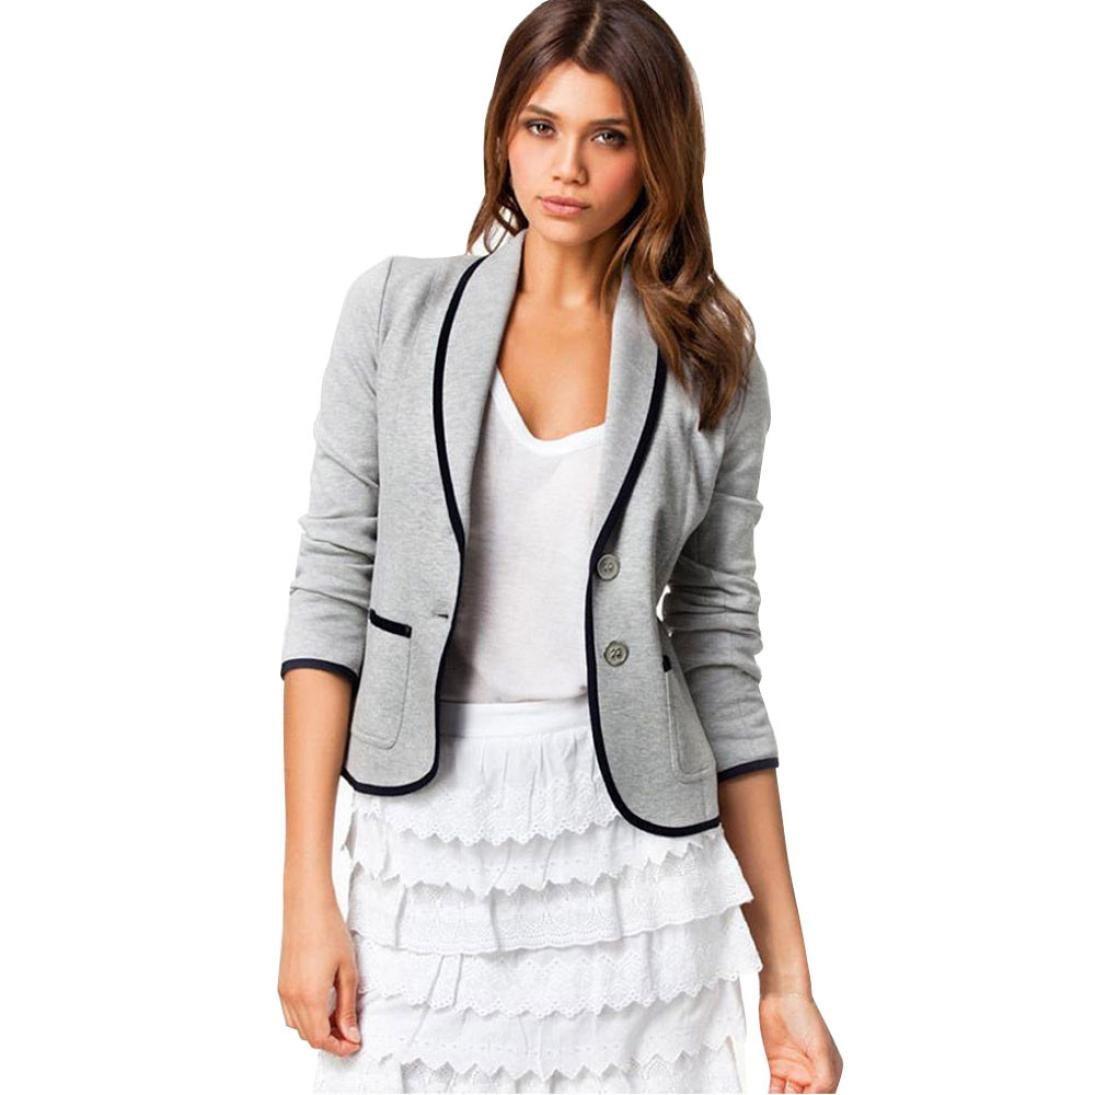 Teresamoon Women 3/4 Sleeve Blazer Open Front Cardigan Jacket Work Office Blazer Teresamoon-Shirt